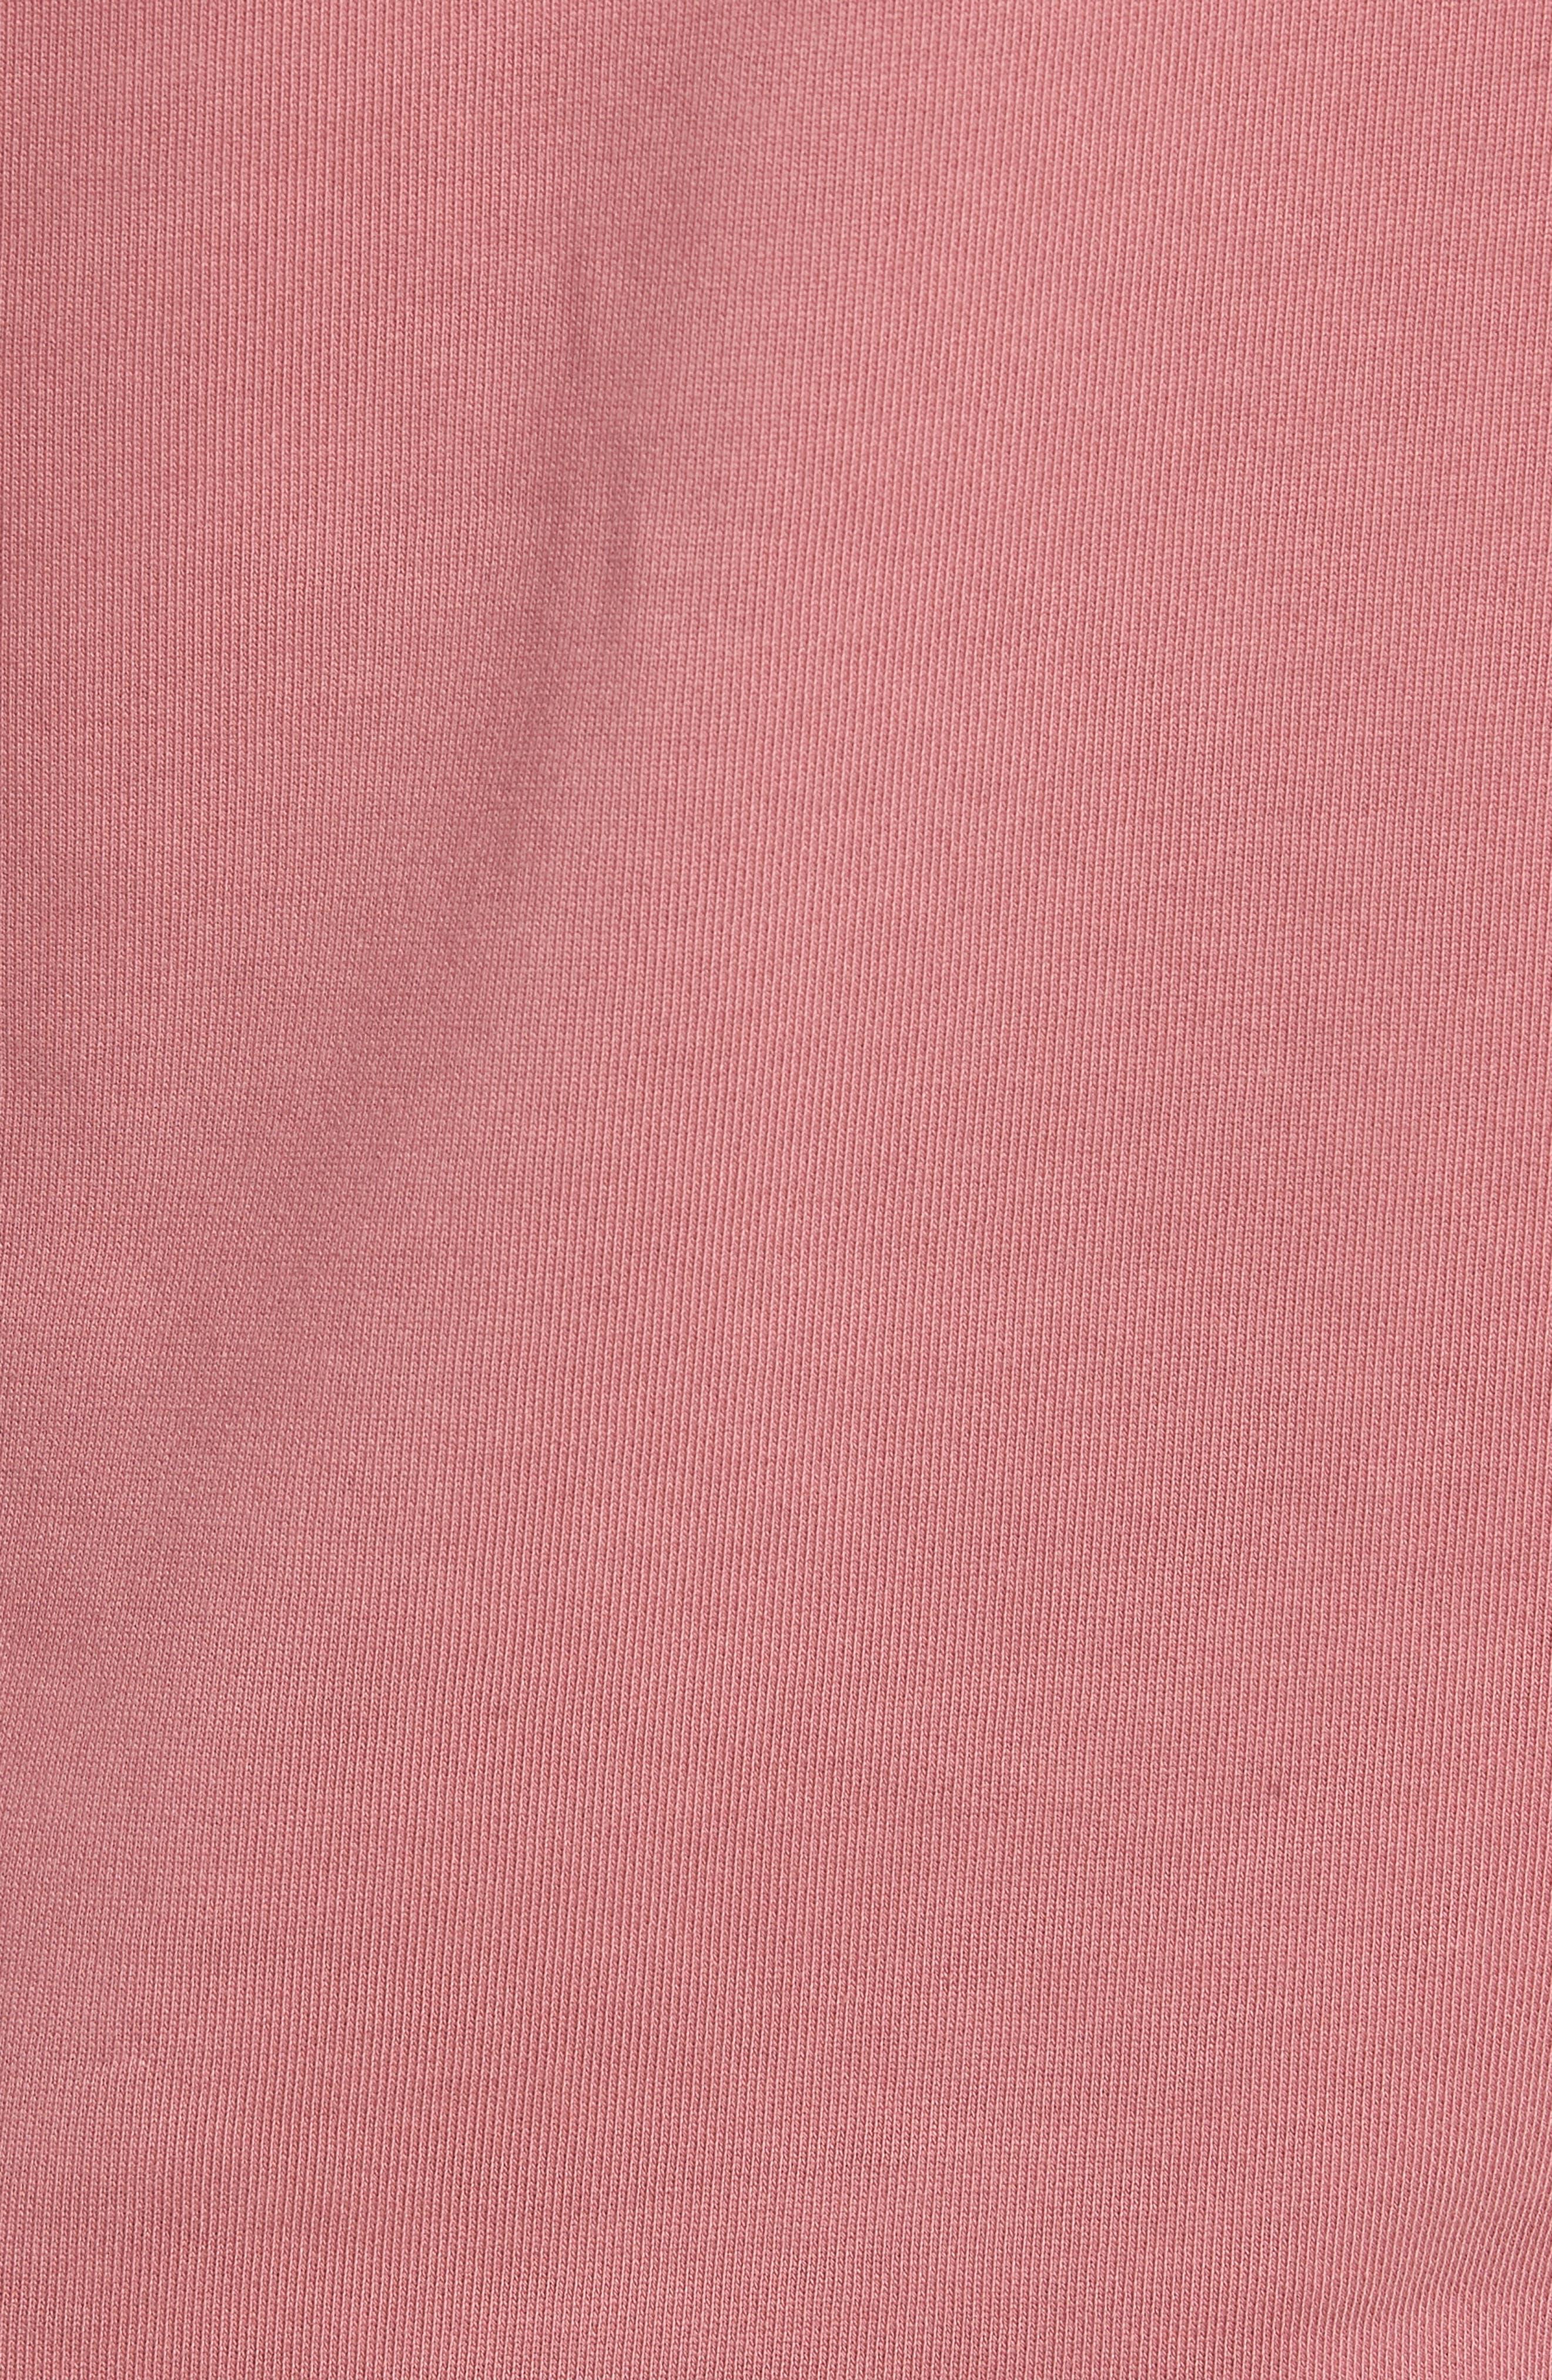 Bowery Sweatshirt,                             Alternate thumbnail 5, color,                             650